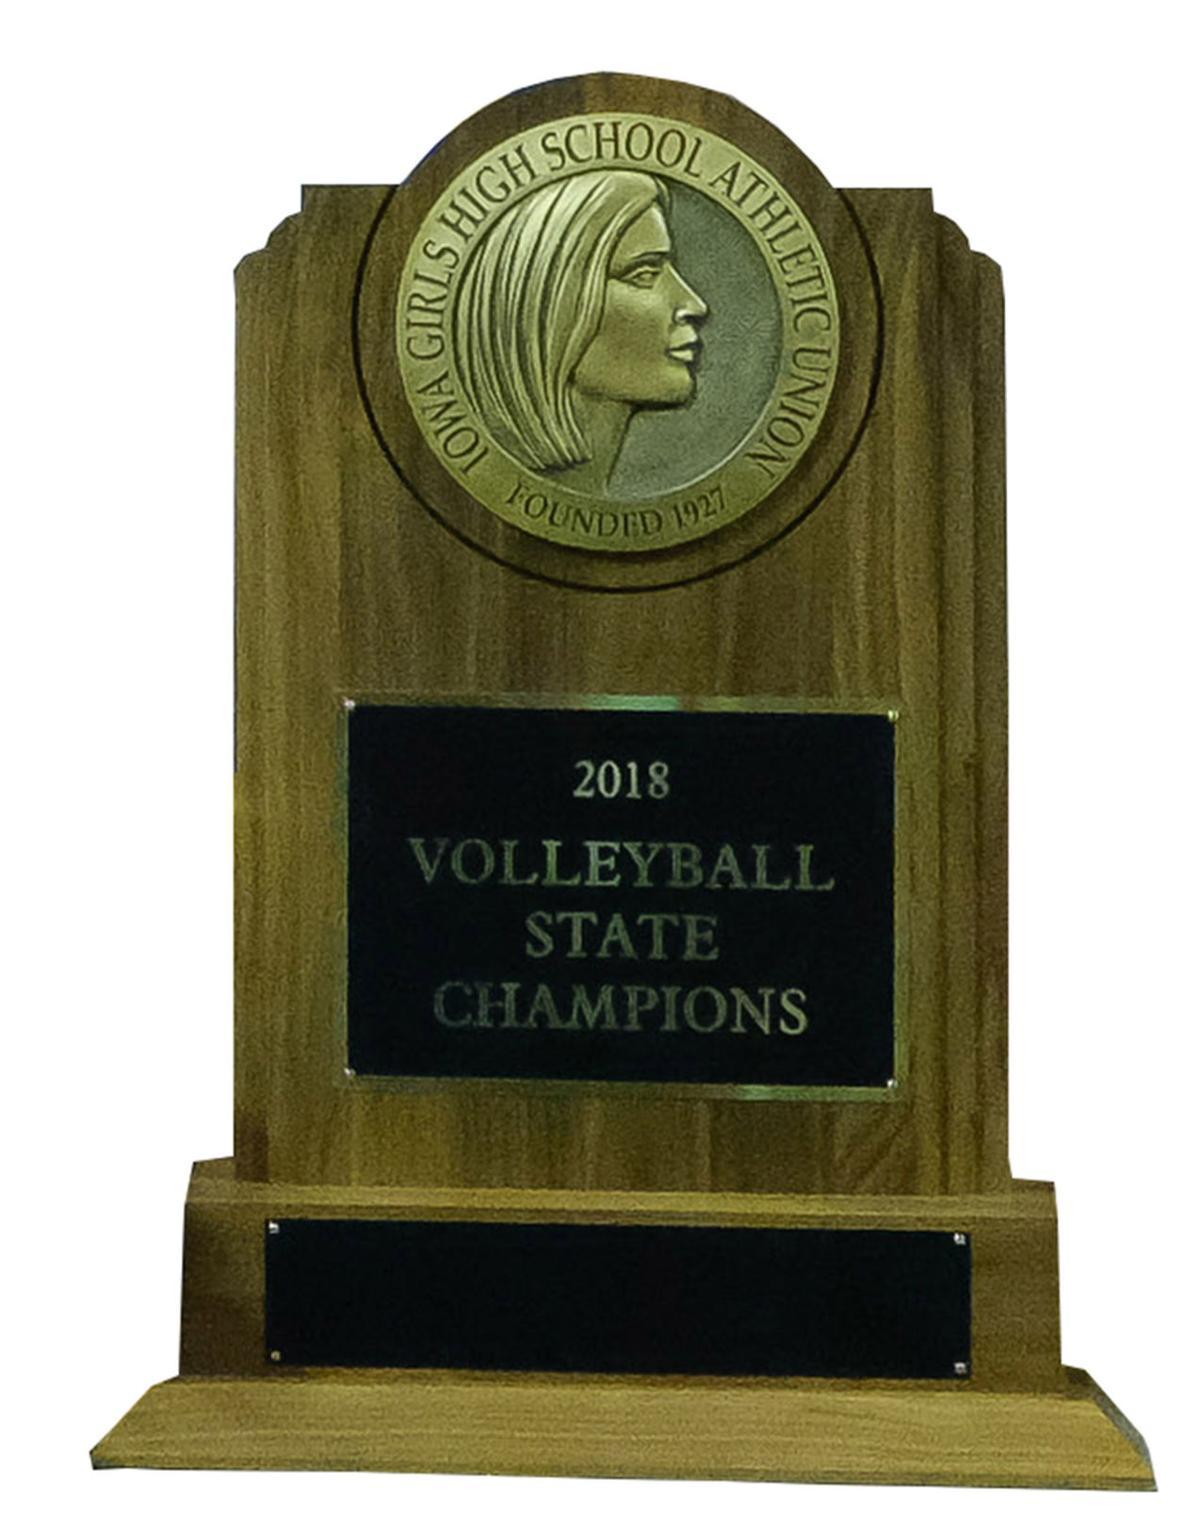 vb state trophy